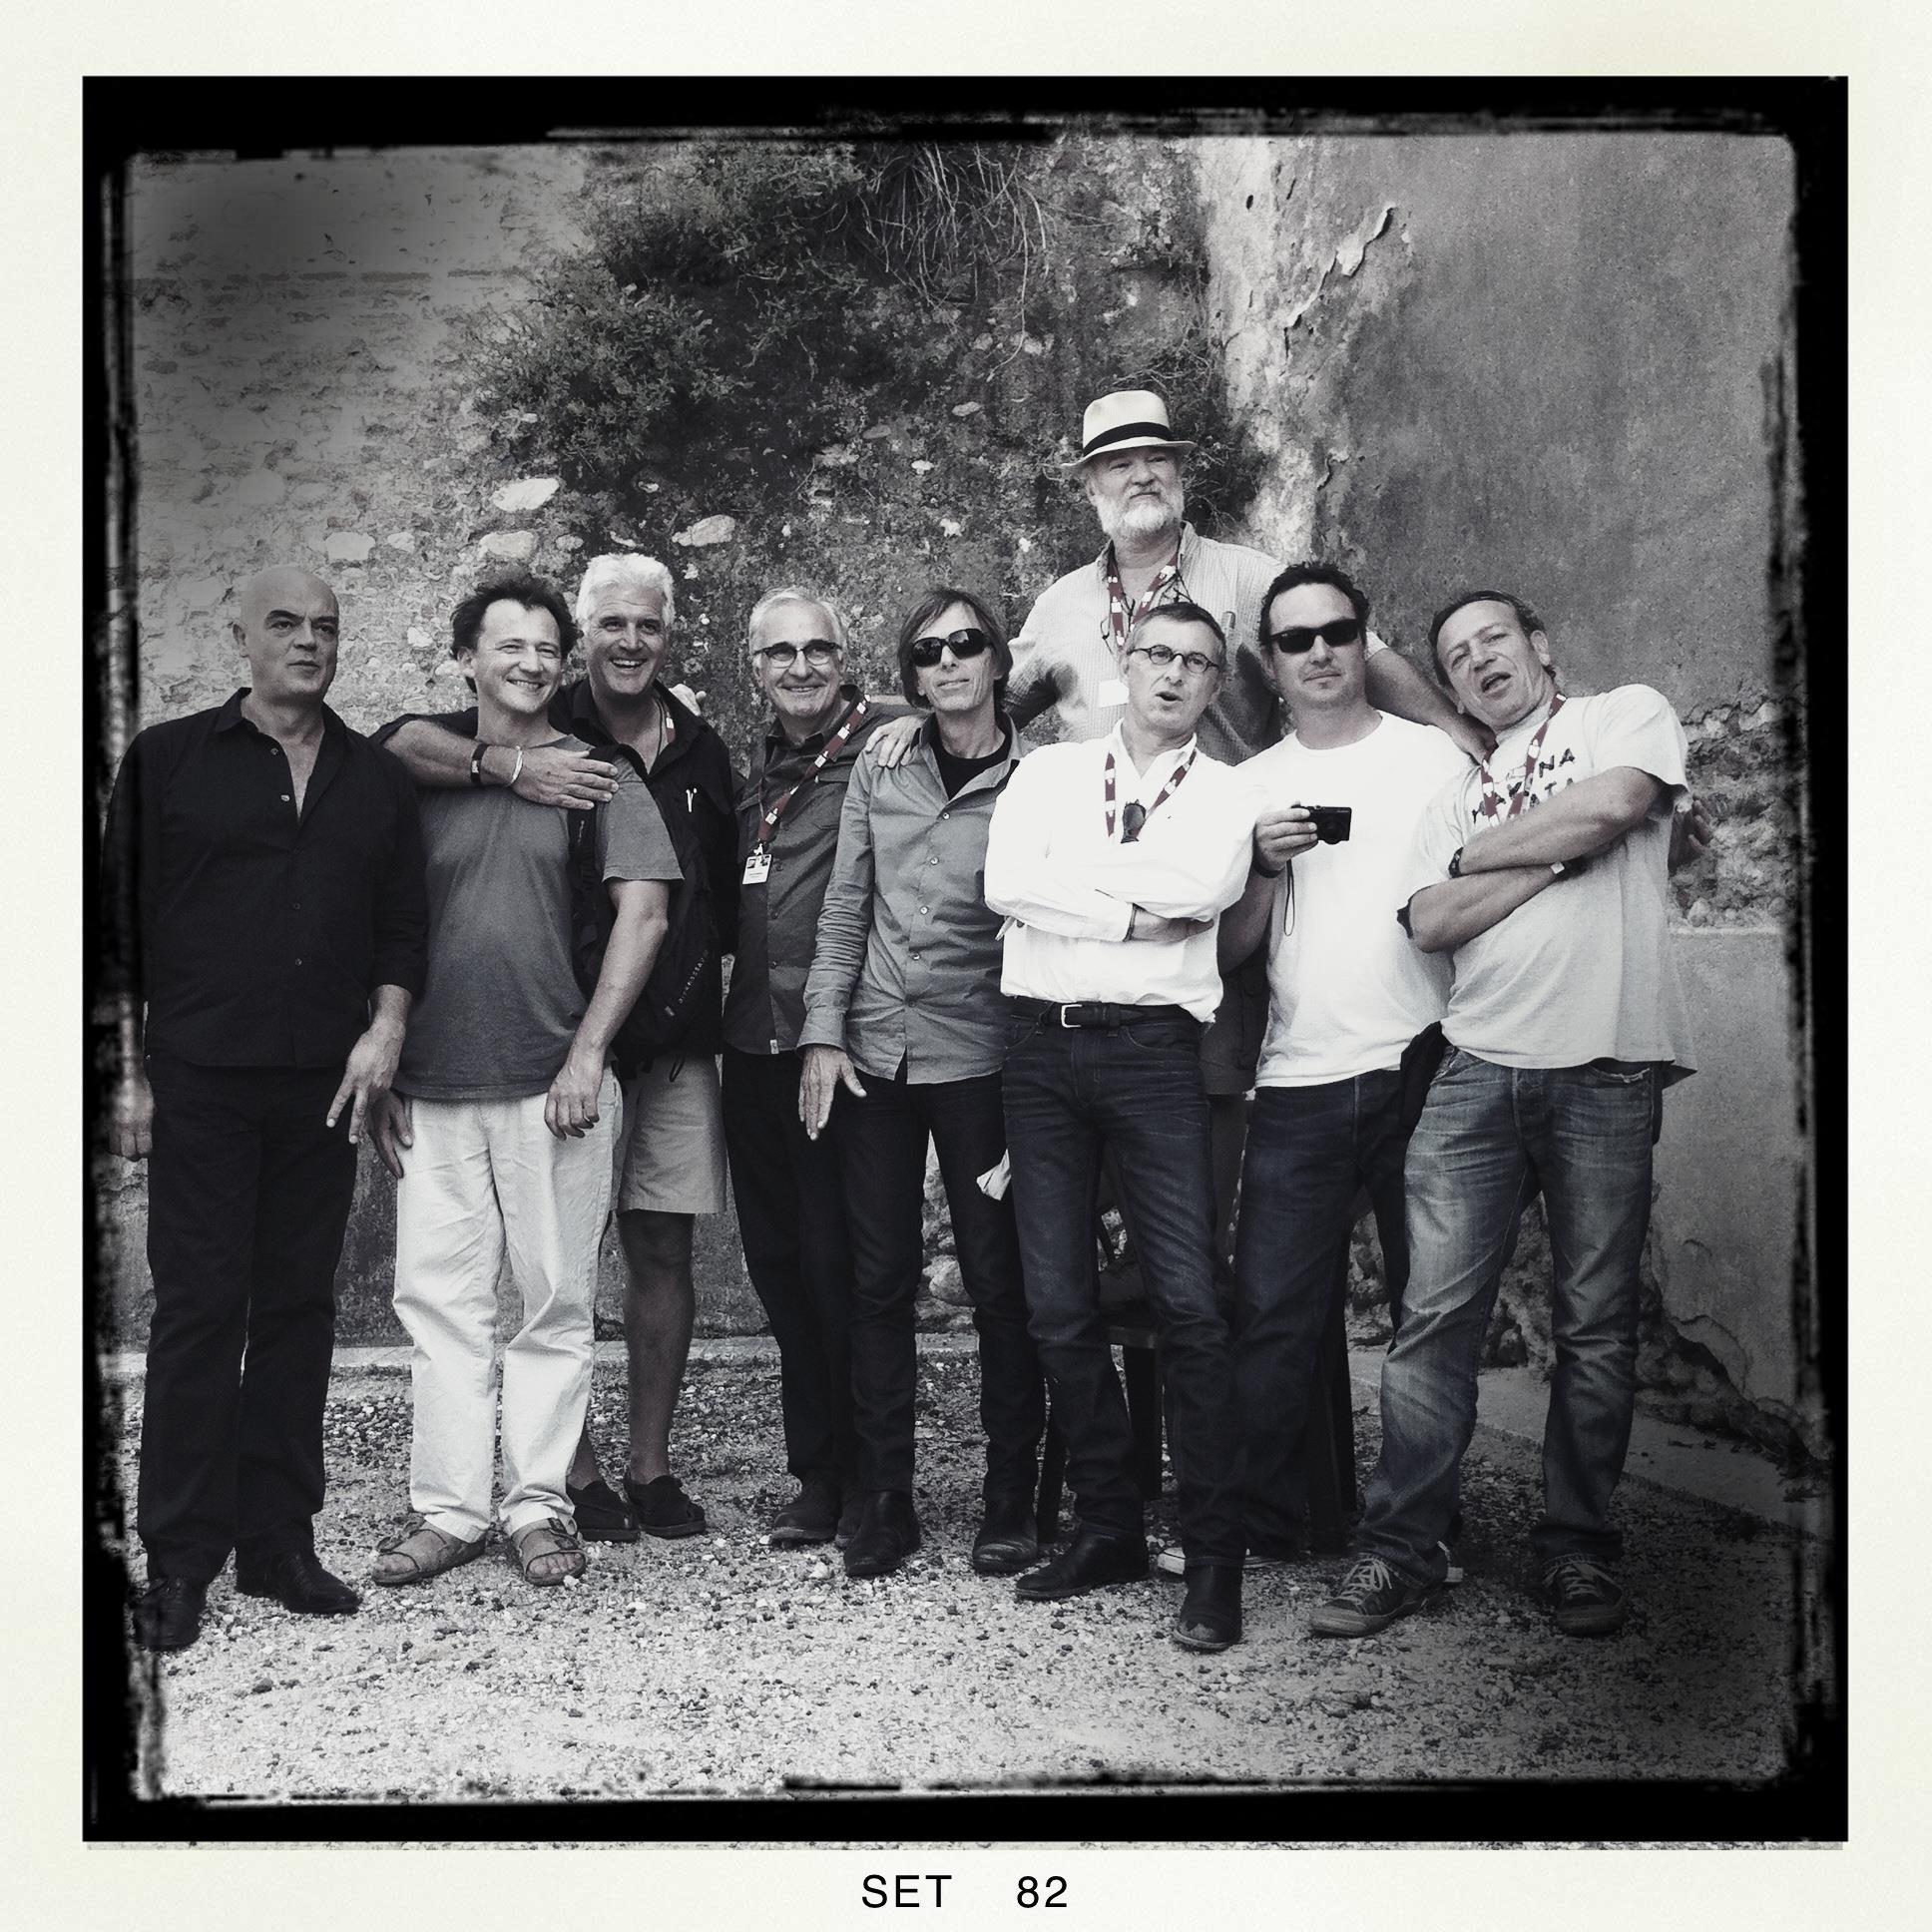 Rémy Ourdan, Olivier Jobard, GK, Benoit Gysembergh, Christopher Morris, Tom Haley, Jerome Delay, Jon Jones & Darko Bandic